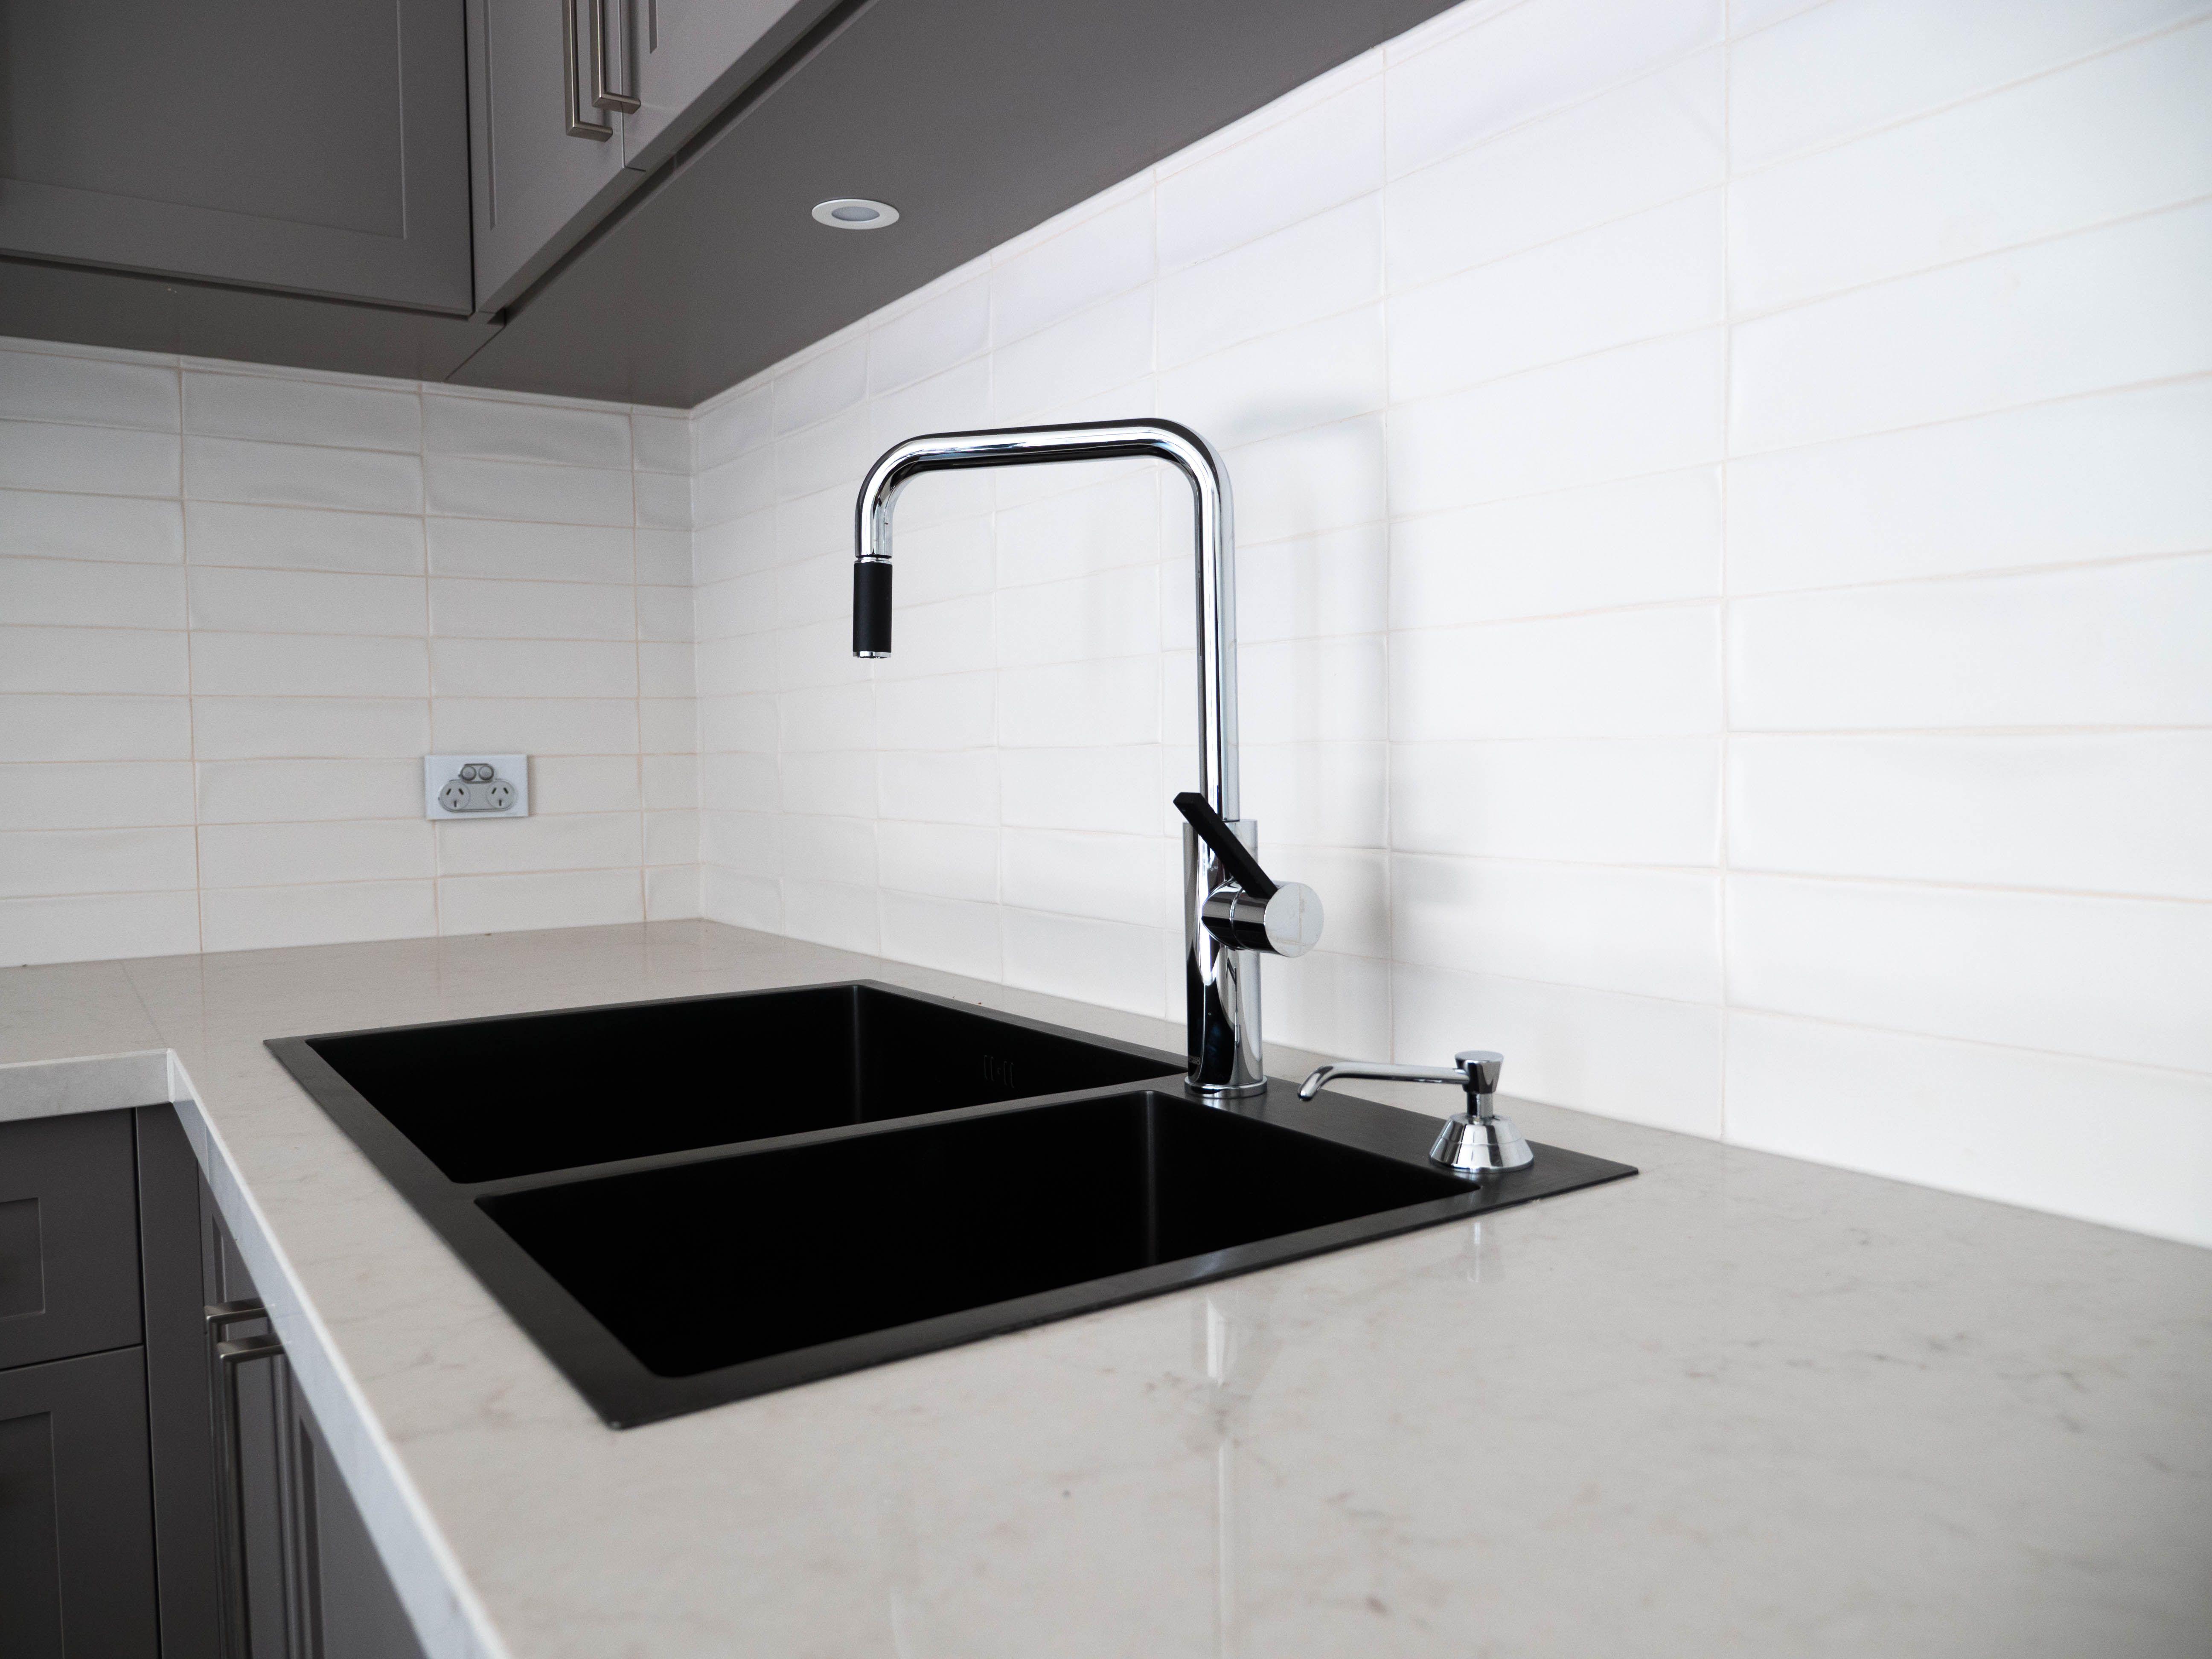 graphite black stainless steel sink graphite black stainless steel rh pinterest com